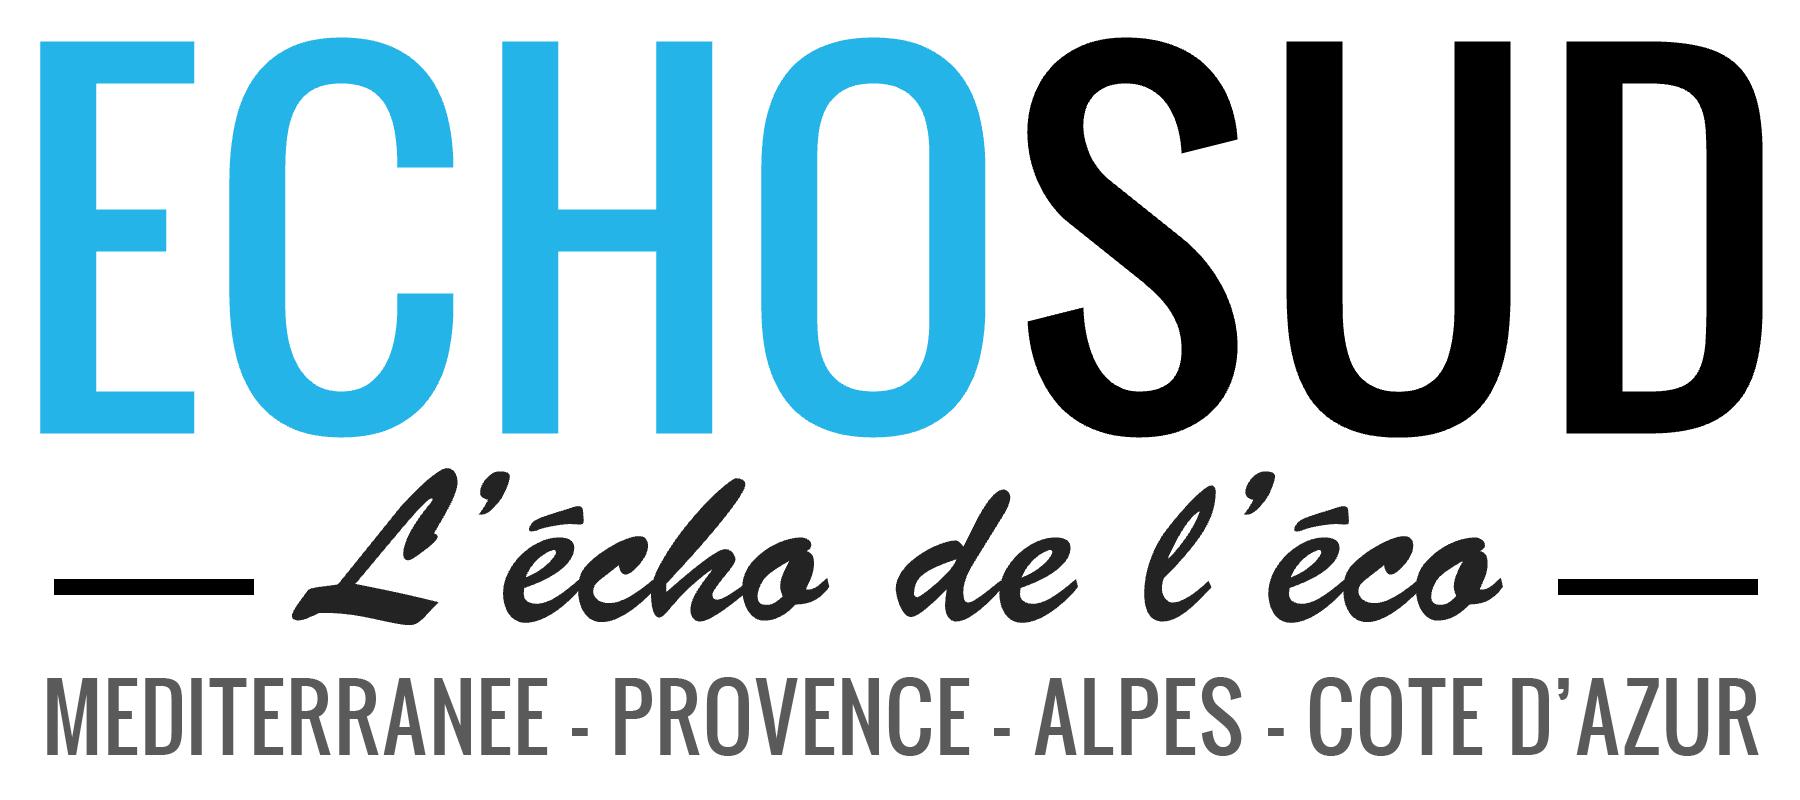 EchoSud